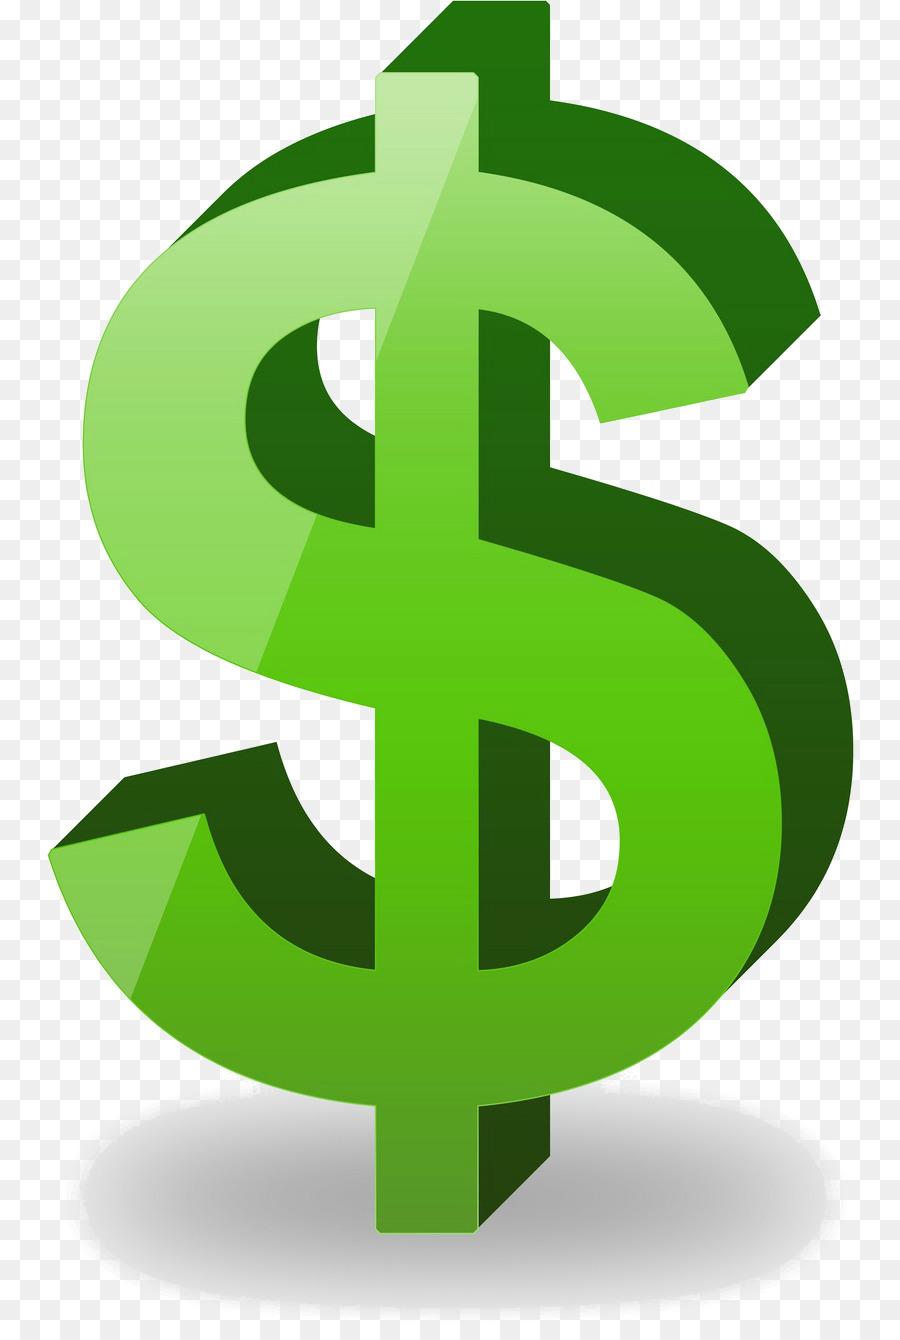 Картинка доллара для презентации